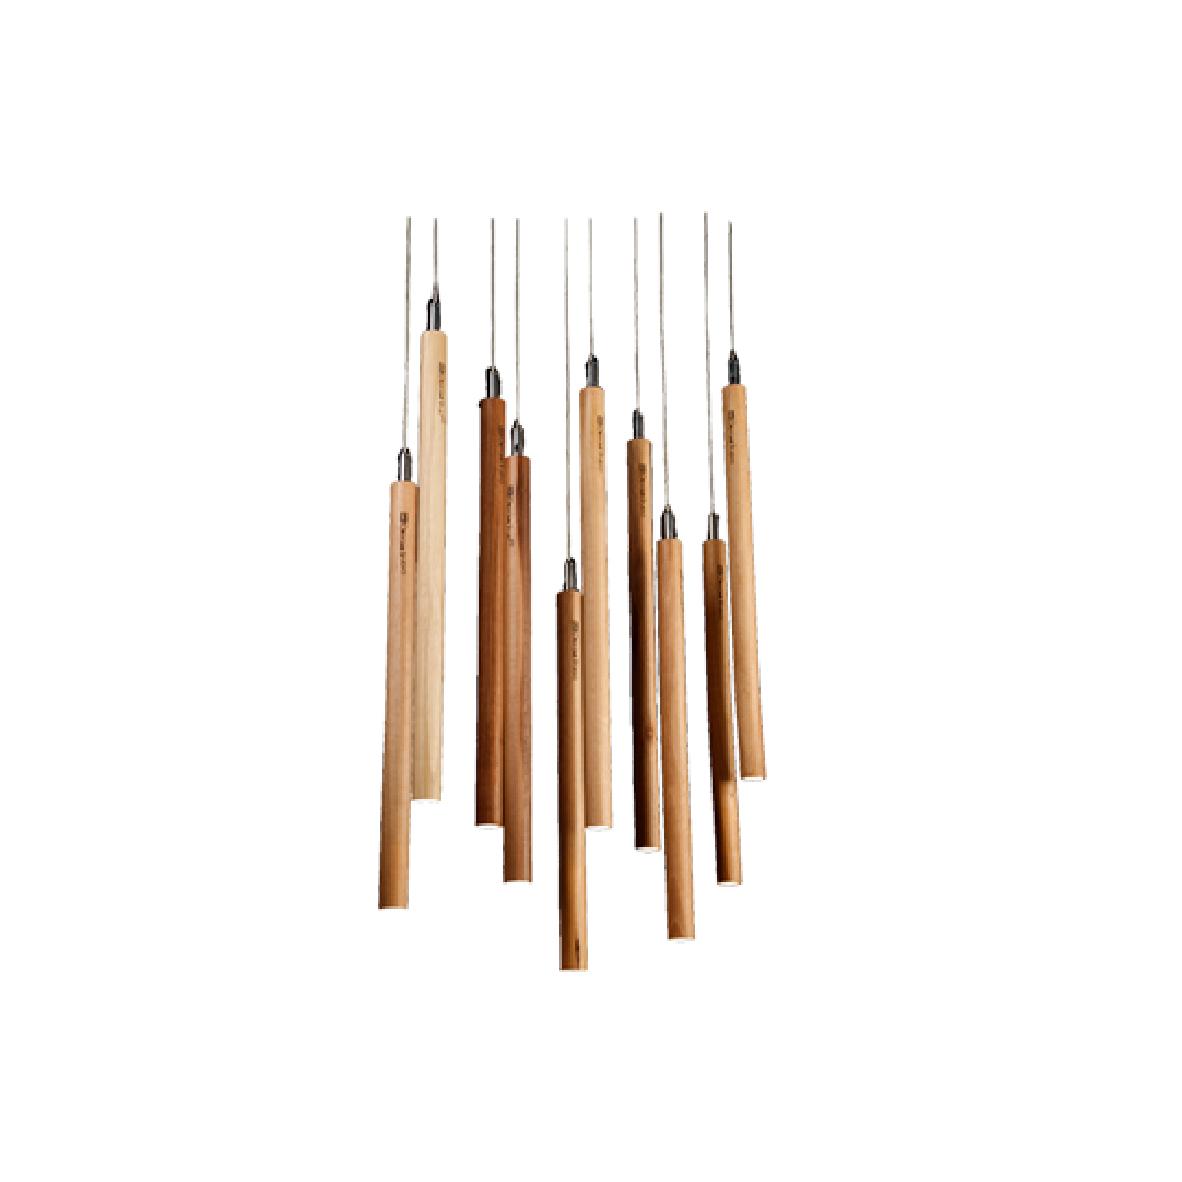 چراغ دکوراتیو چوبی SO-1381-40CM-Lآویز